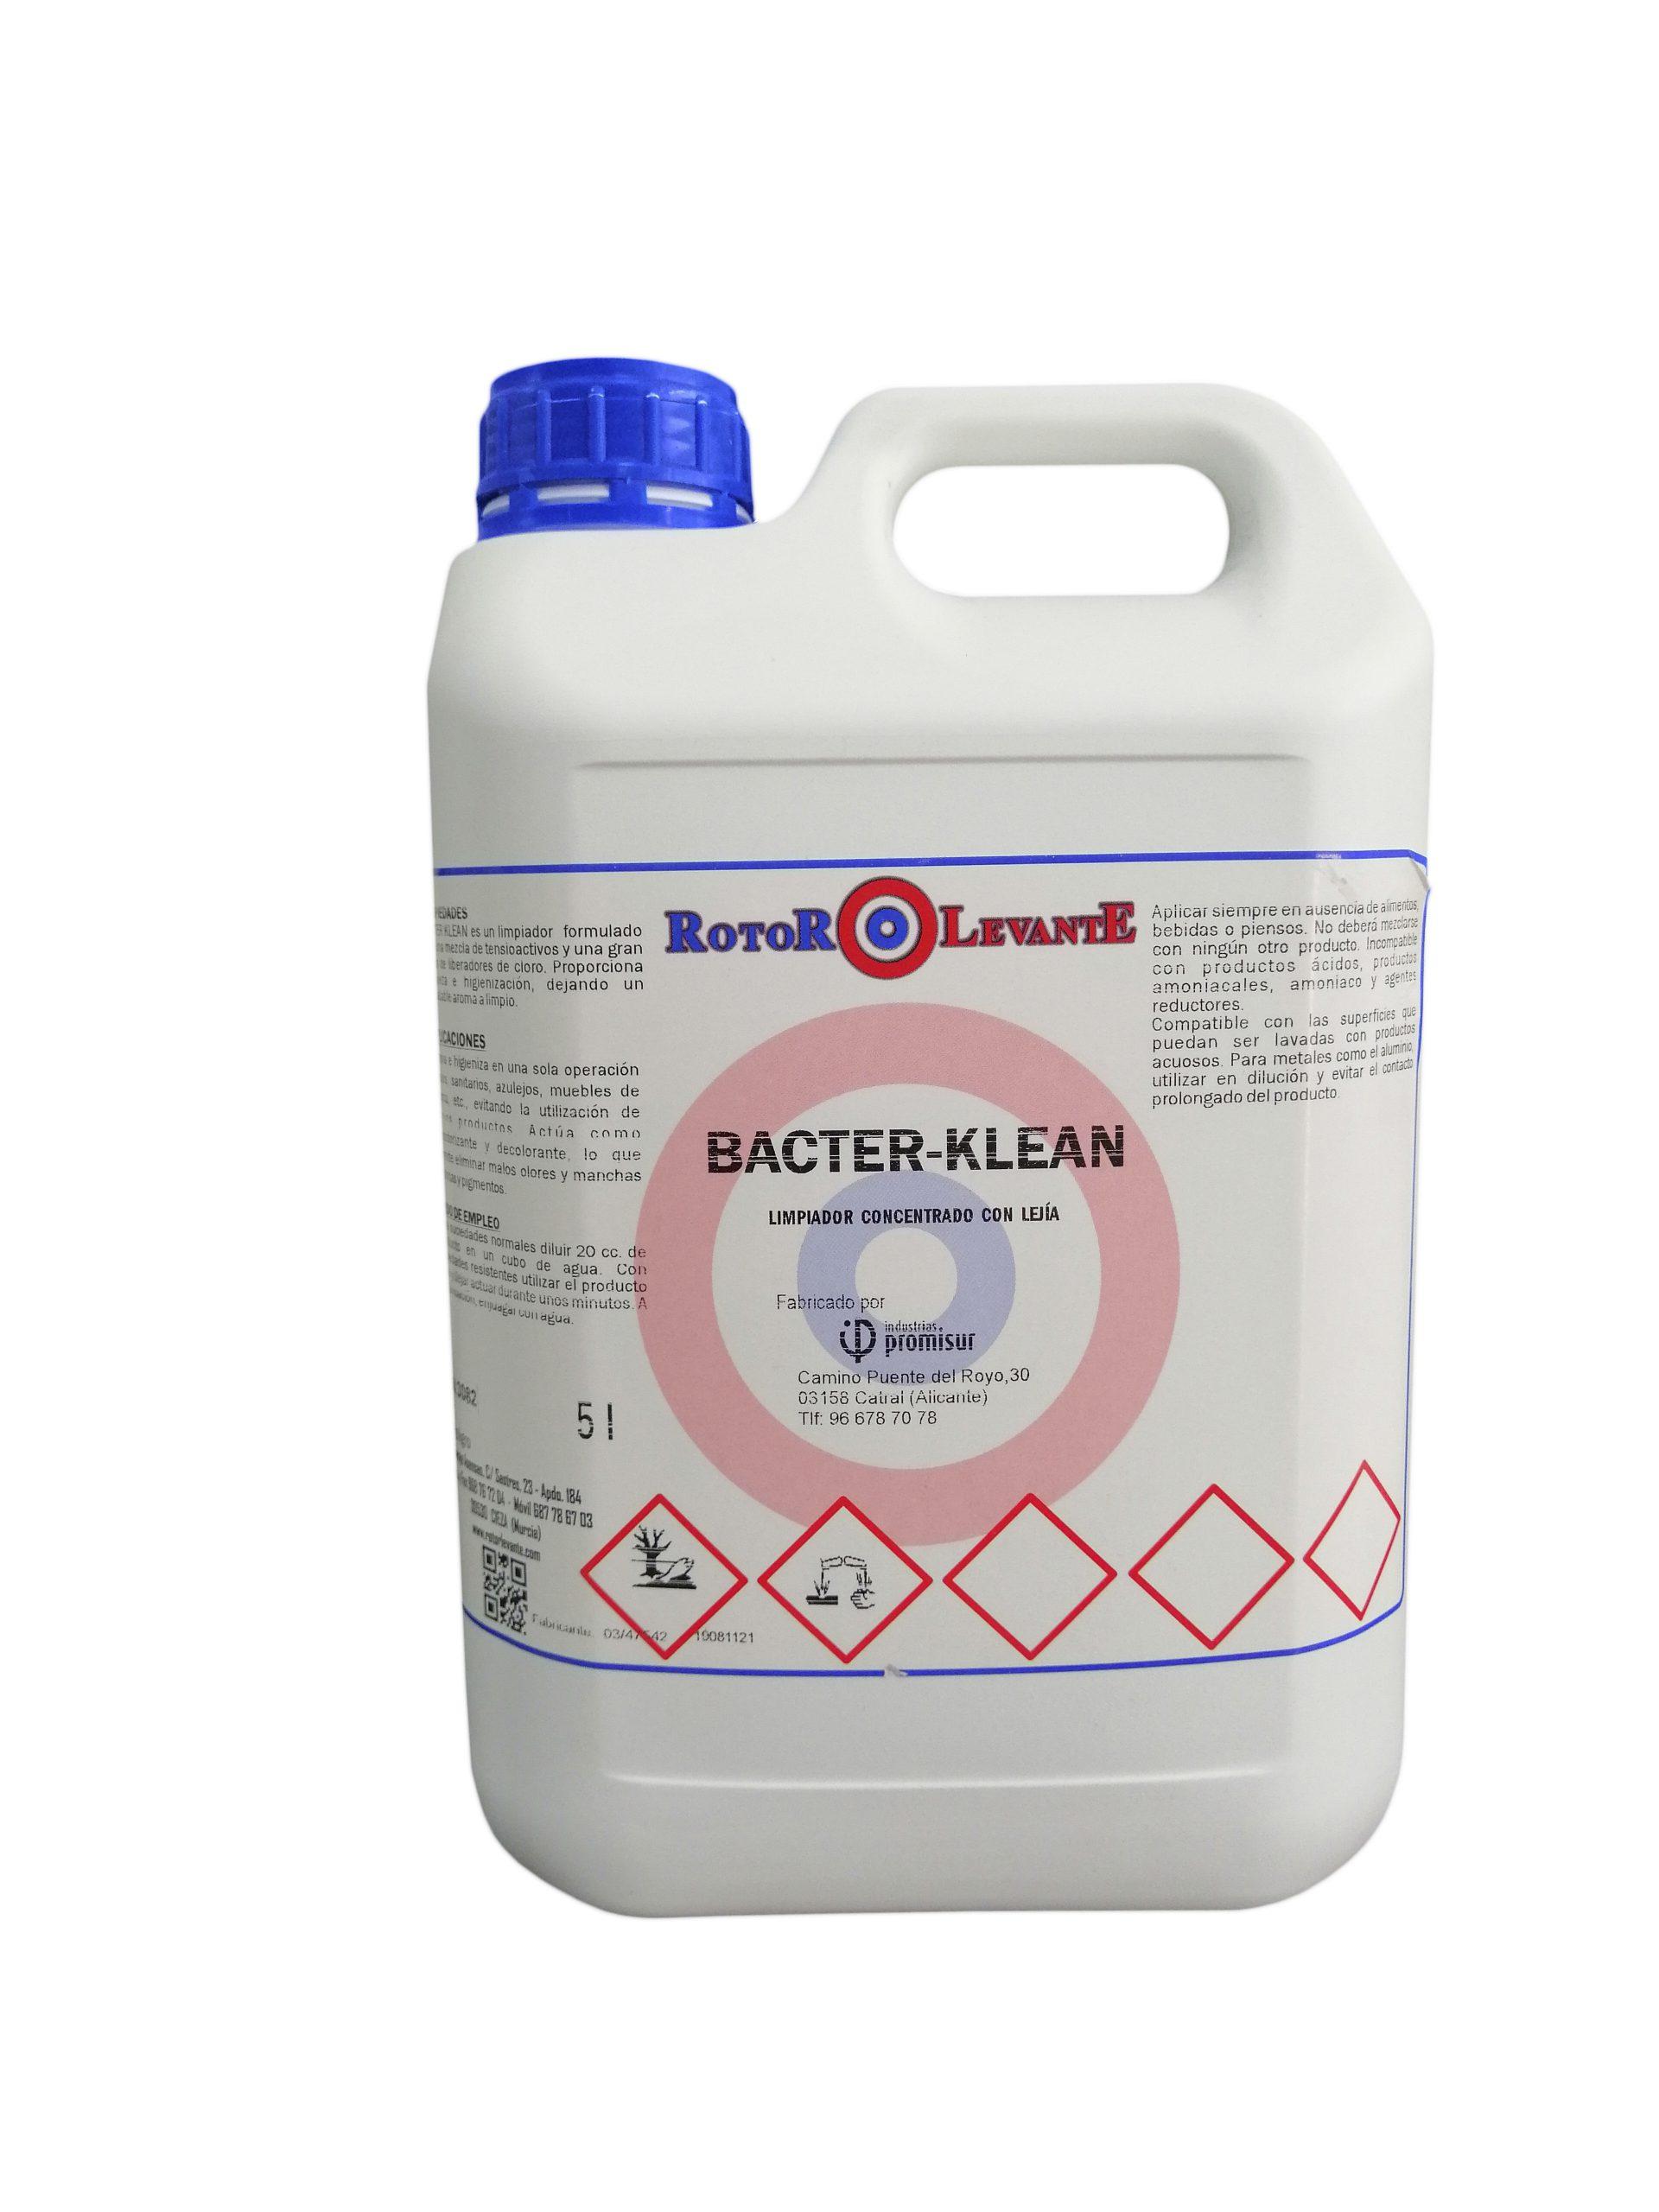 detergente desinfectante rotor levante